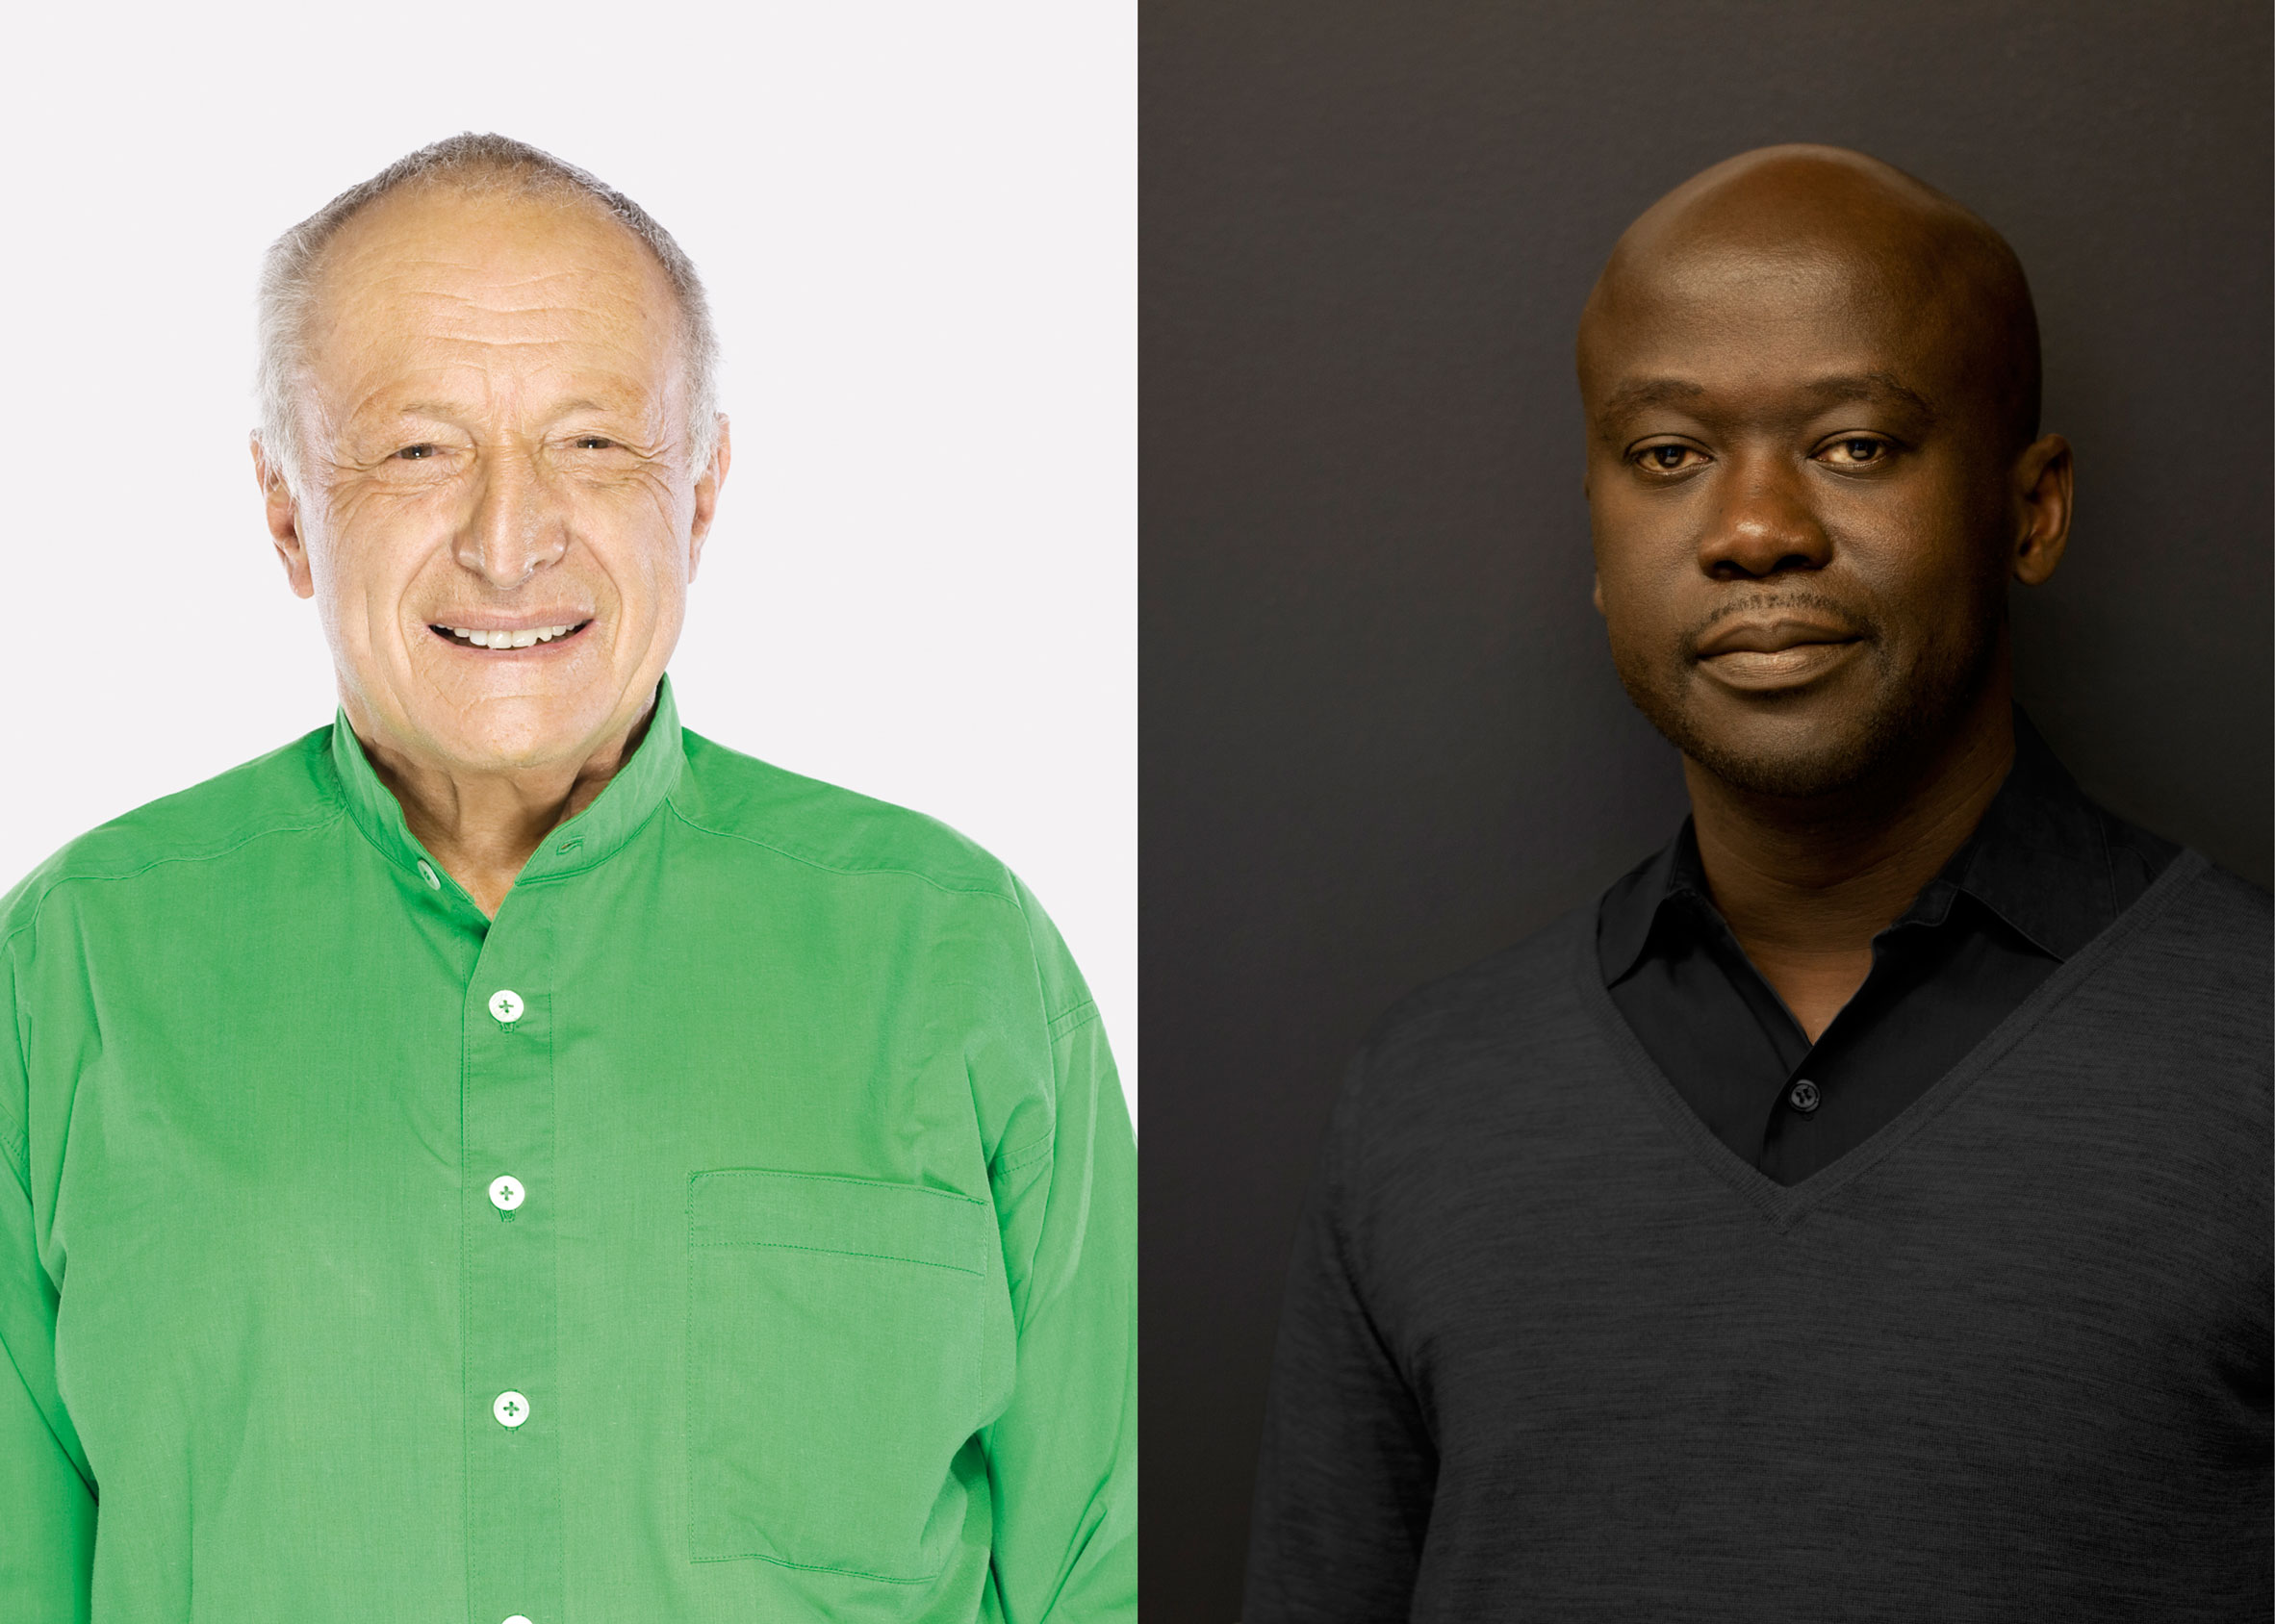 Richard Rogers and David Adjaye to select next Serpentine Pavilion architect